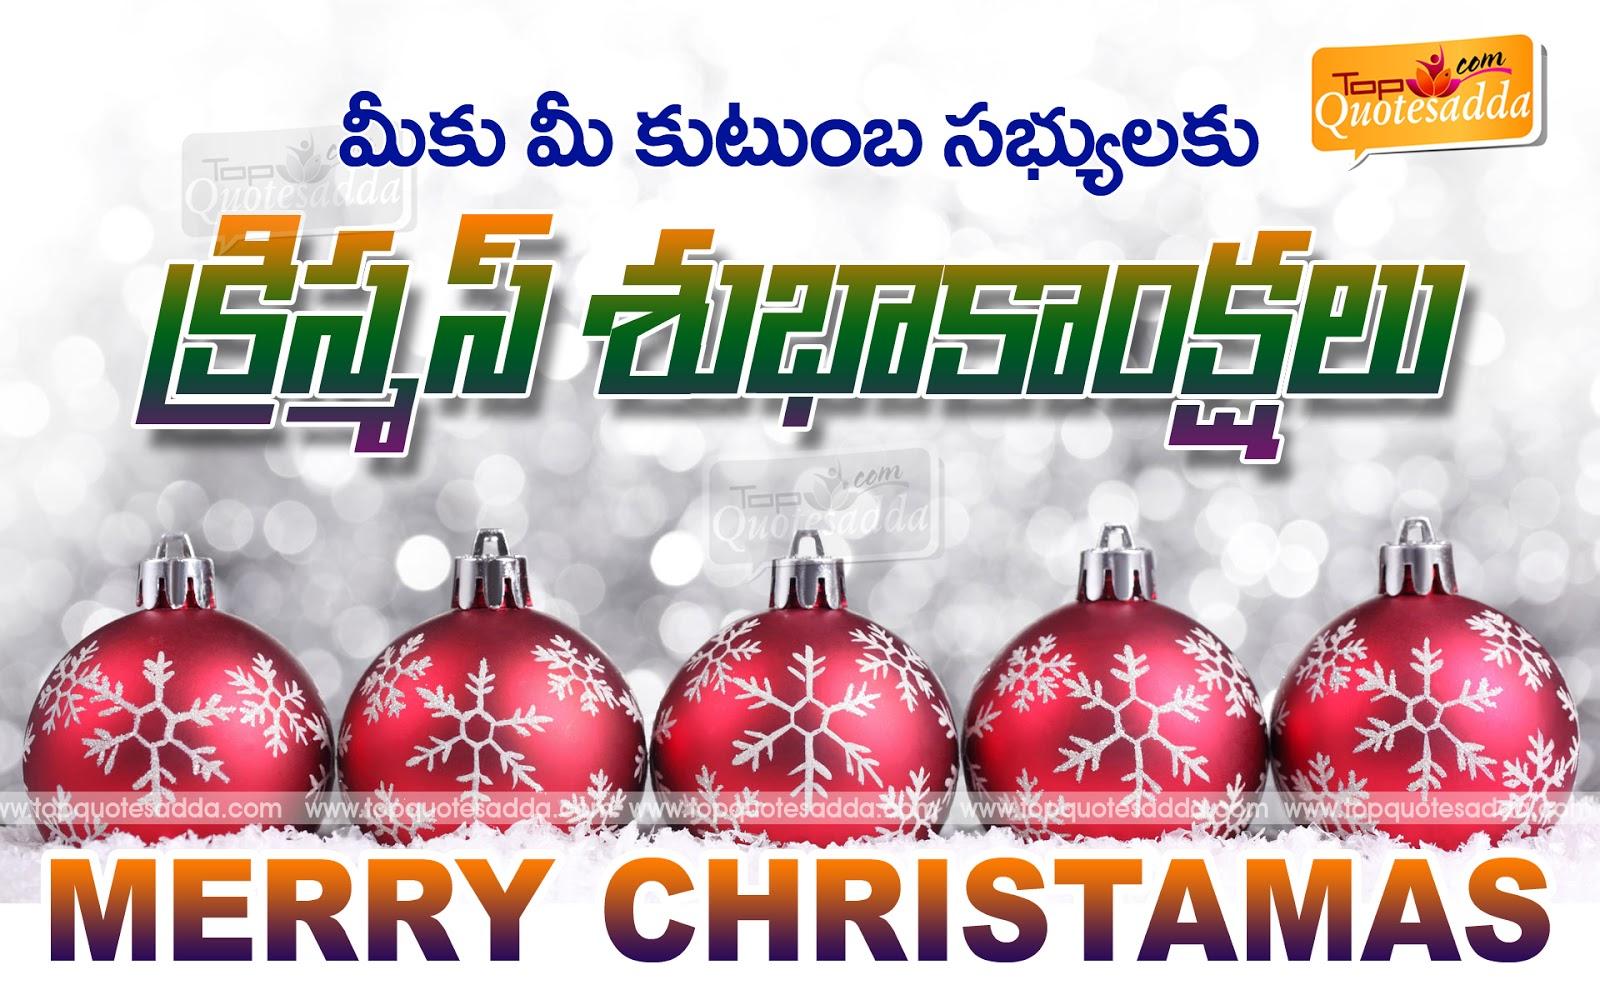 Happy Christmas Telugu Greetings For Christmas Cards Topquotesadda